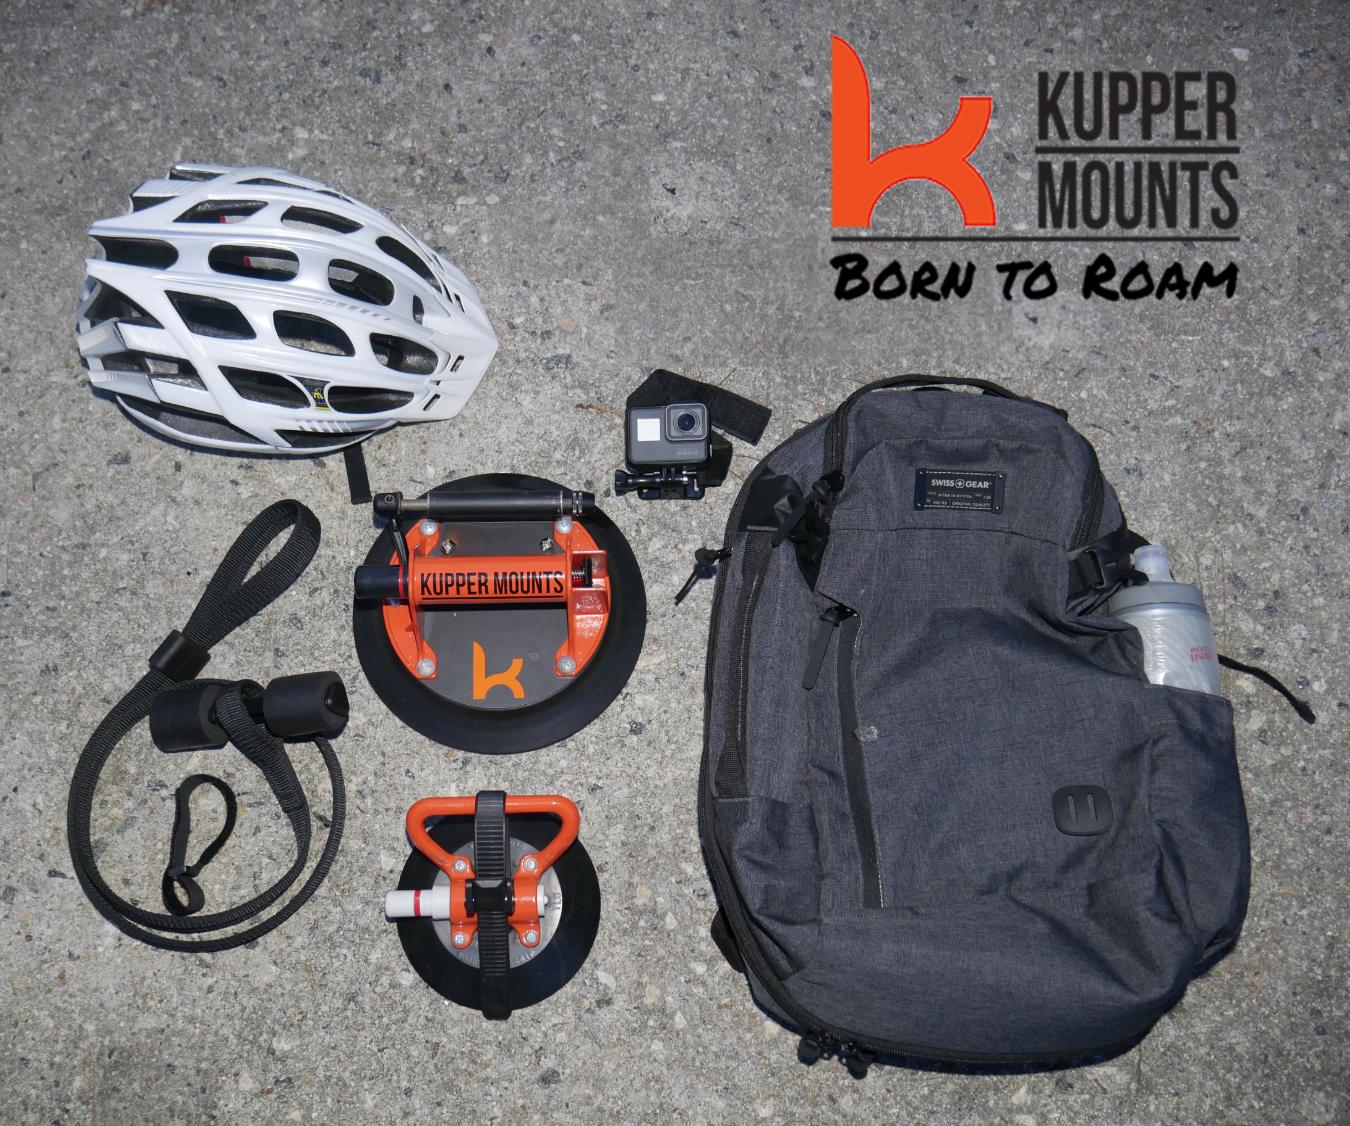 Kupper Bike Rack Mounts Were Born to Roam.png